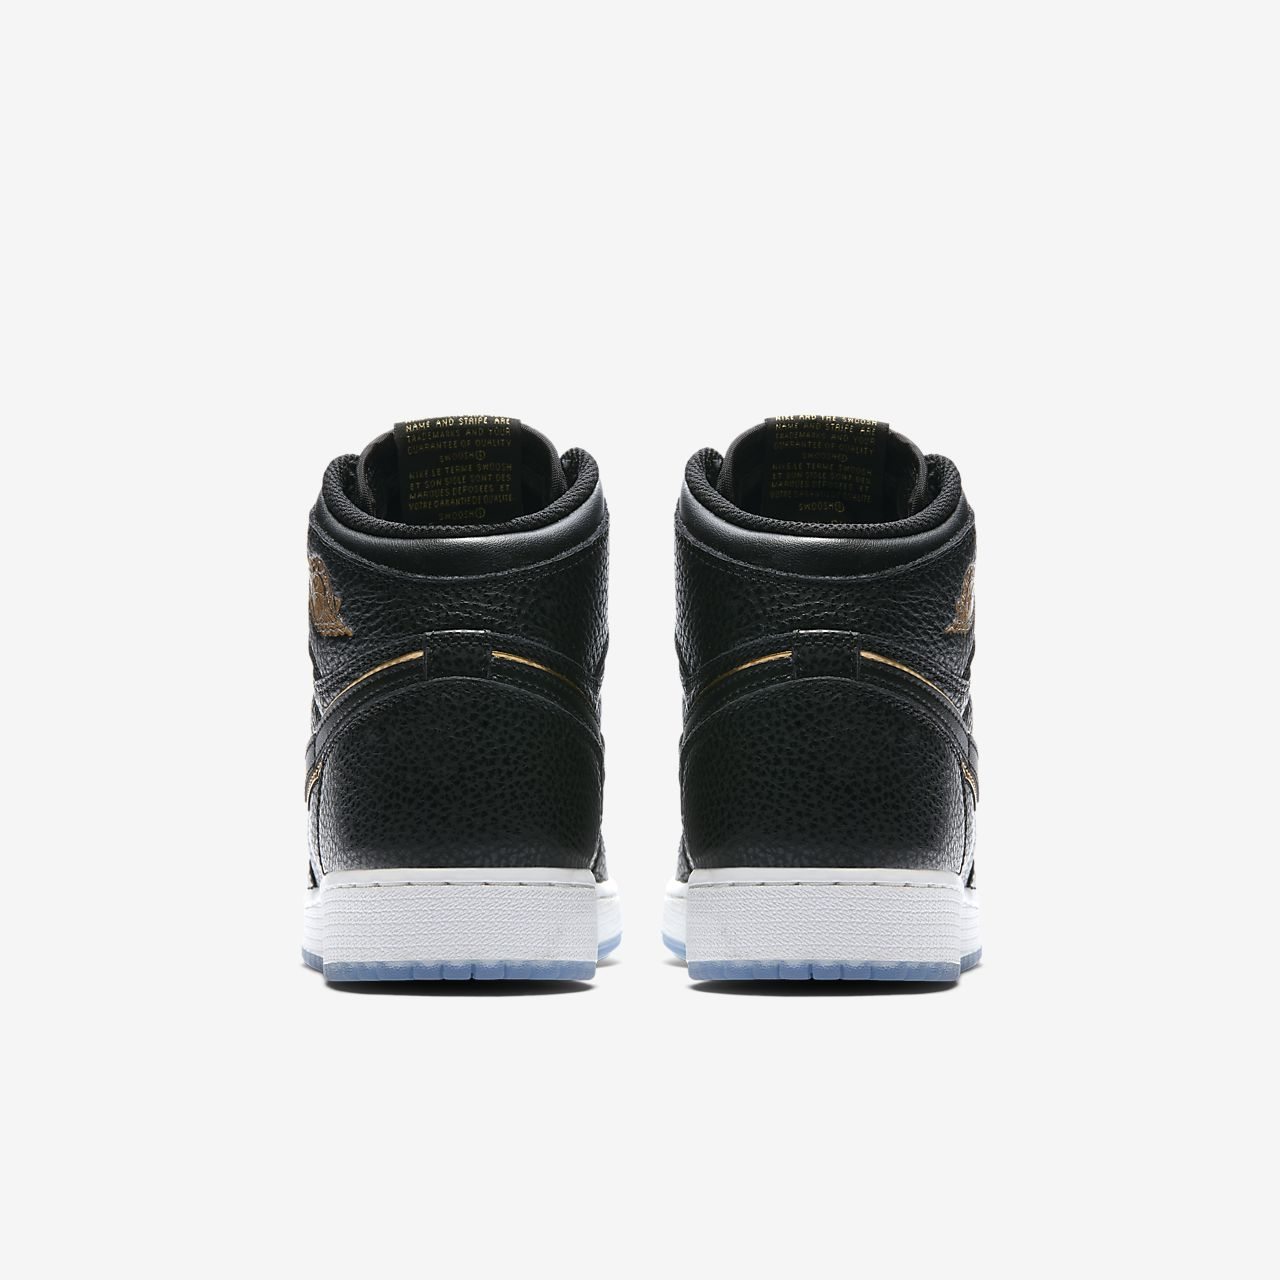 731cddaa4903fb Air Jordan 1 Retro High OG Big Kids Shoe ...